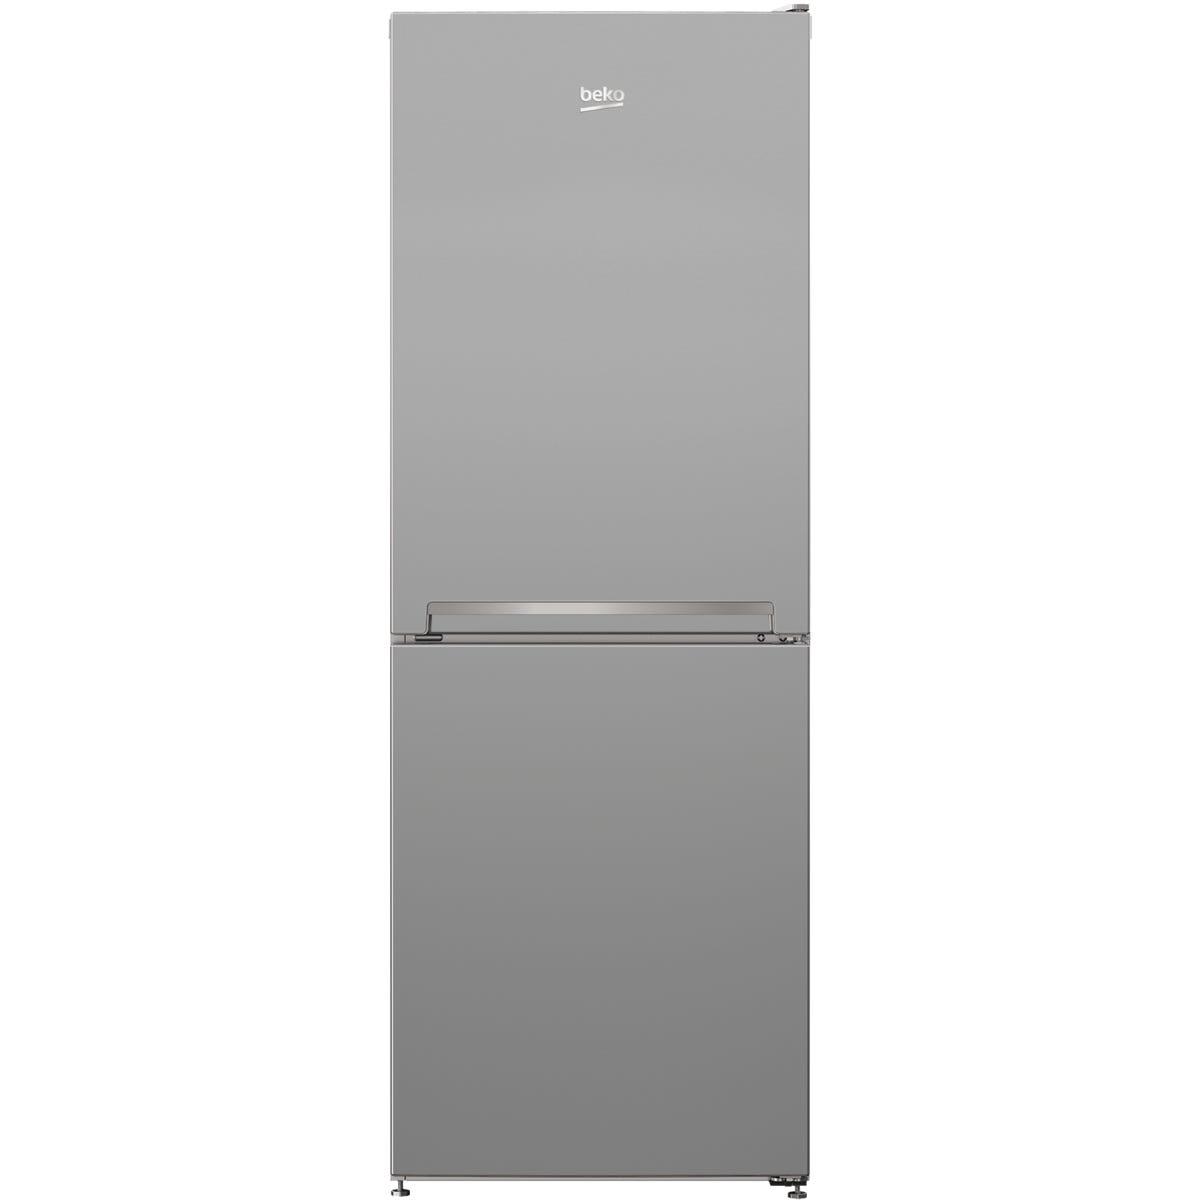 Beko CFG3552S 213L Frost Free Combi Fridge Freezer - Silver